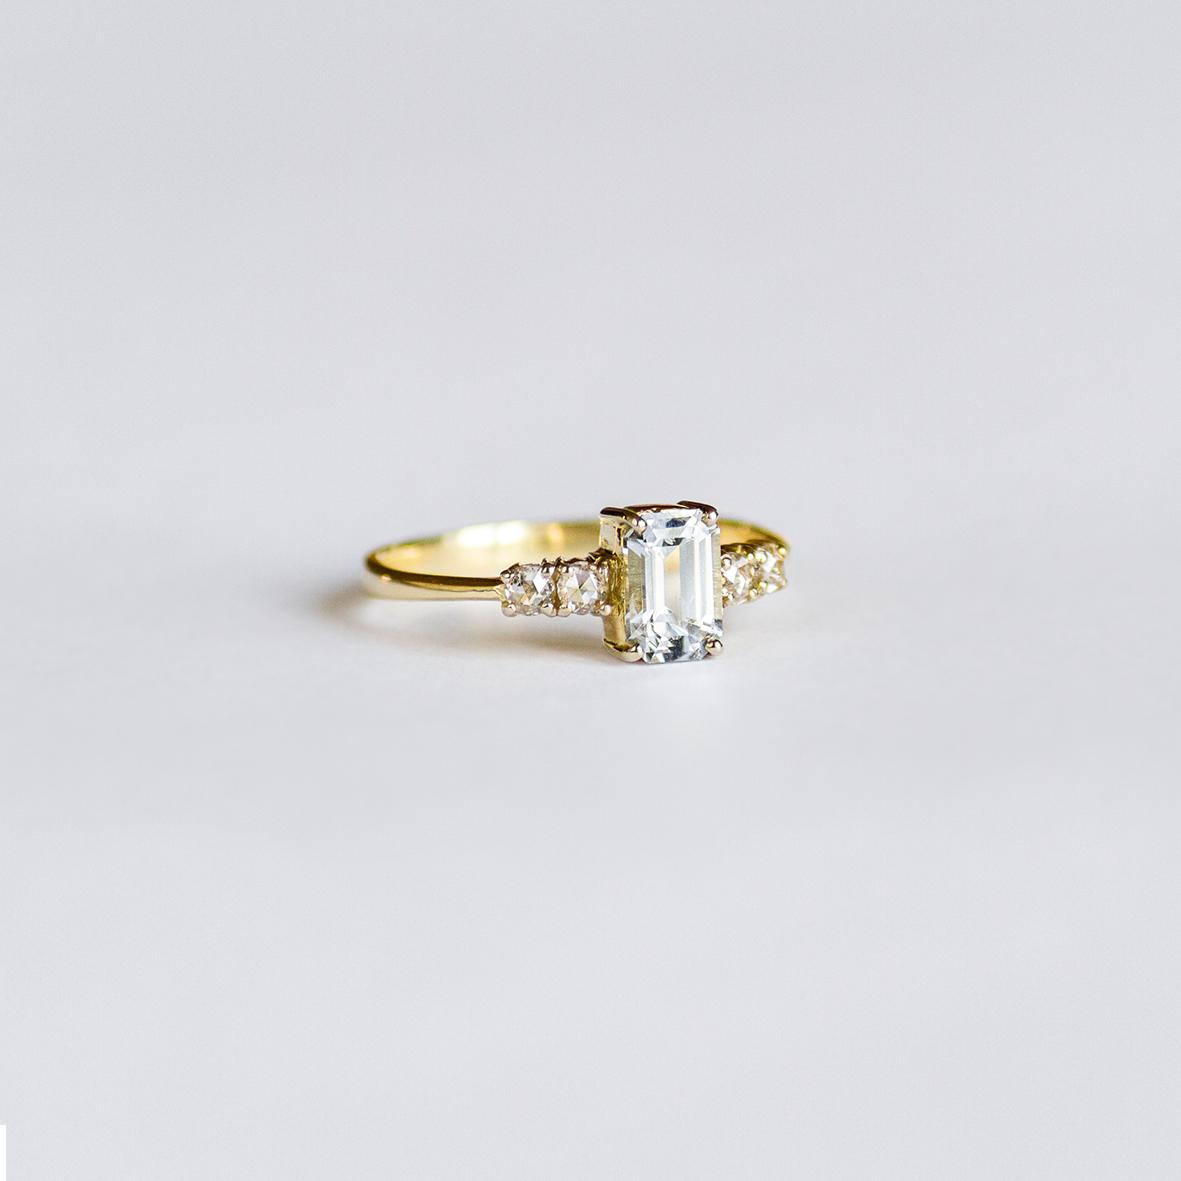 2. OONA_engagement_principal_single sapphire with diamonds ring